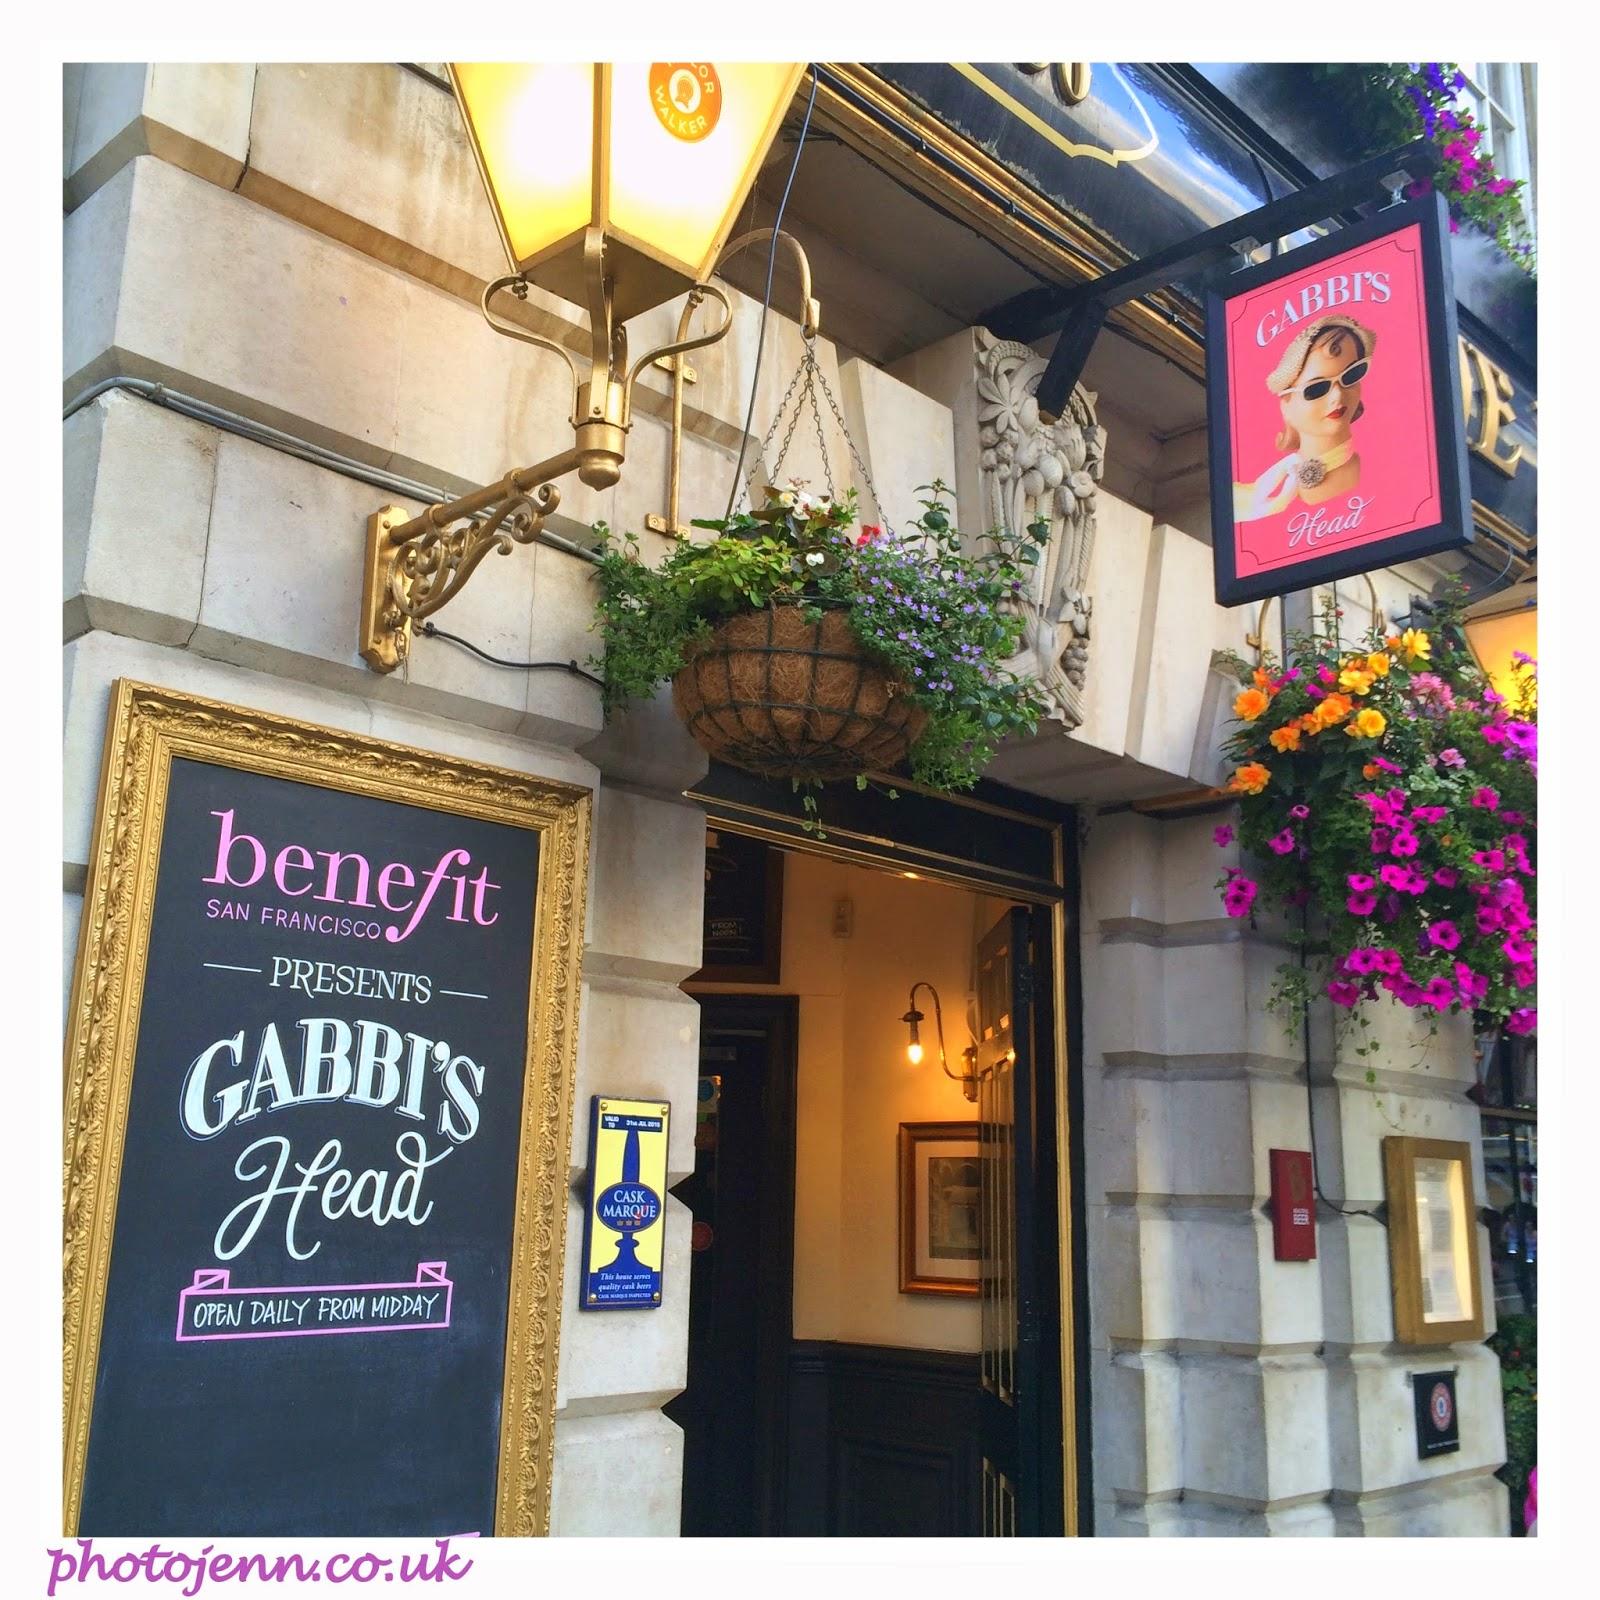 gabbis-head-london-reveiw